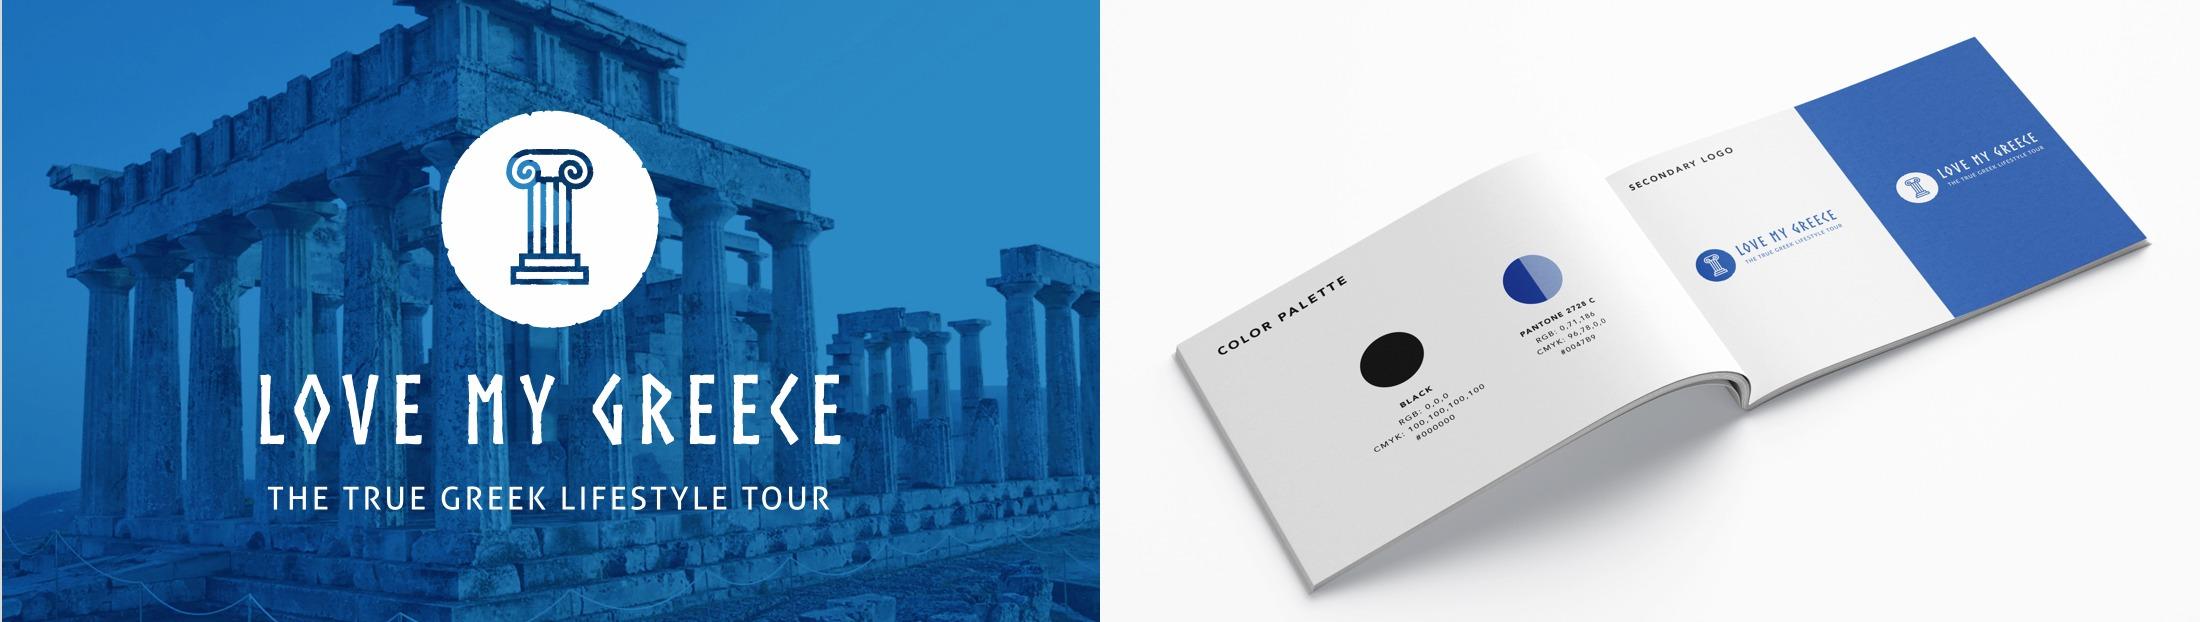 Final Logo Concept - Love My Greece